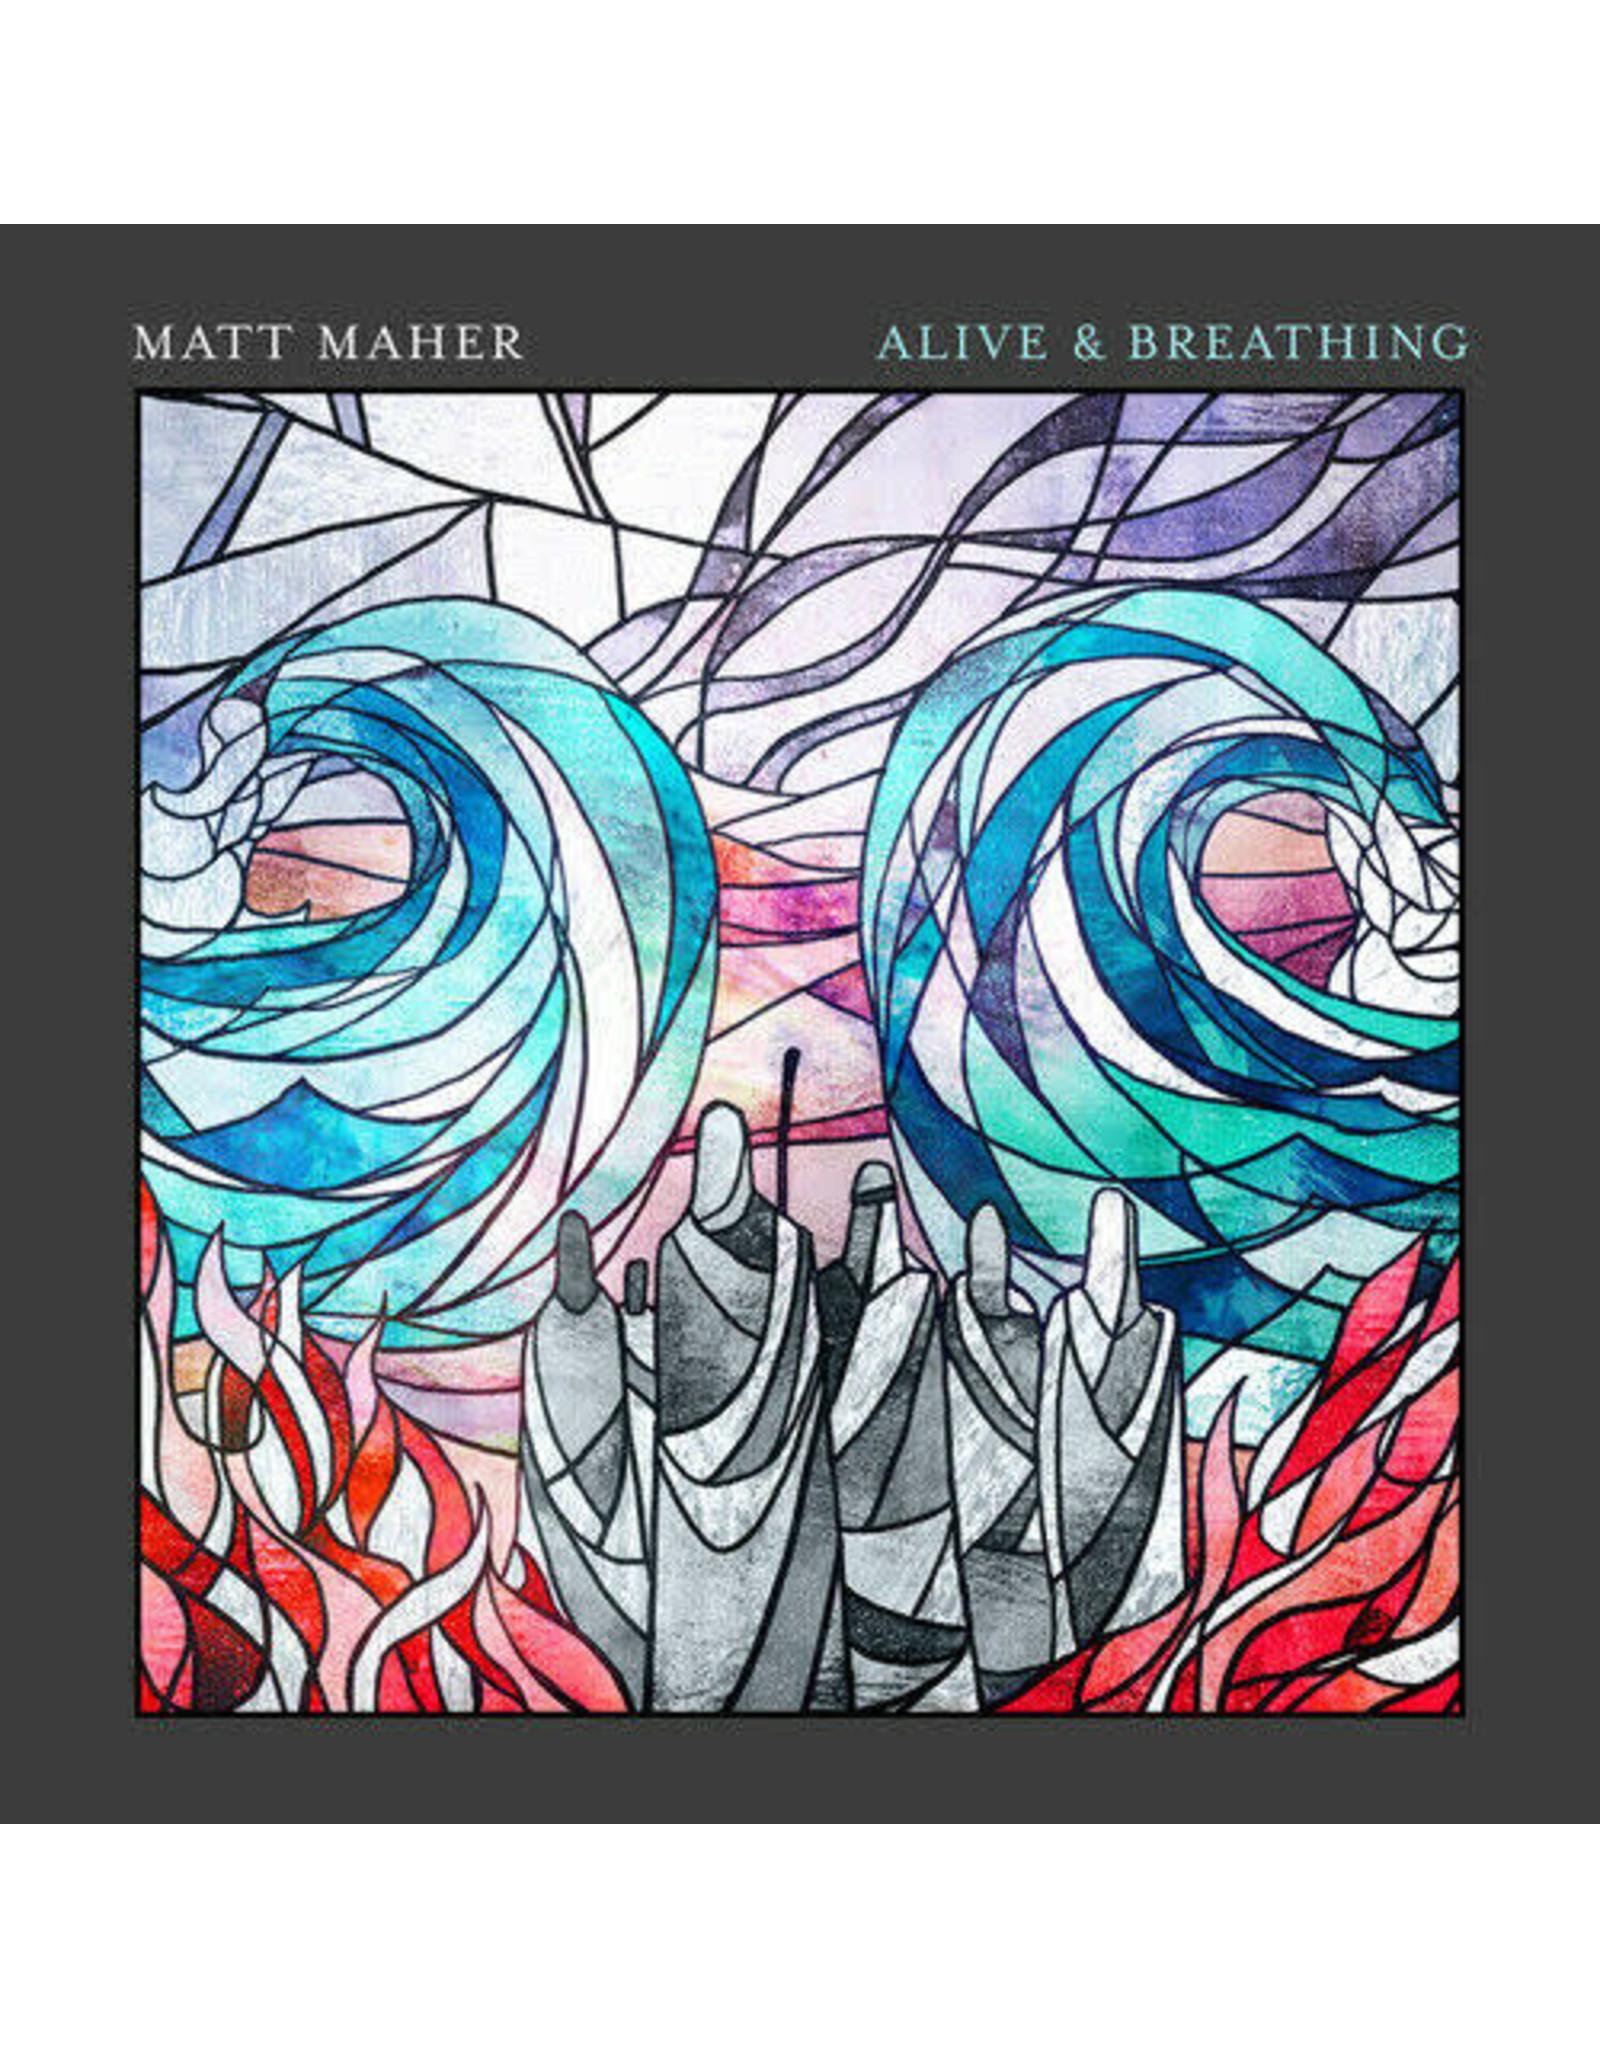 Matt Maher - Alive & Breathing (CD)